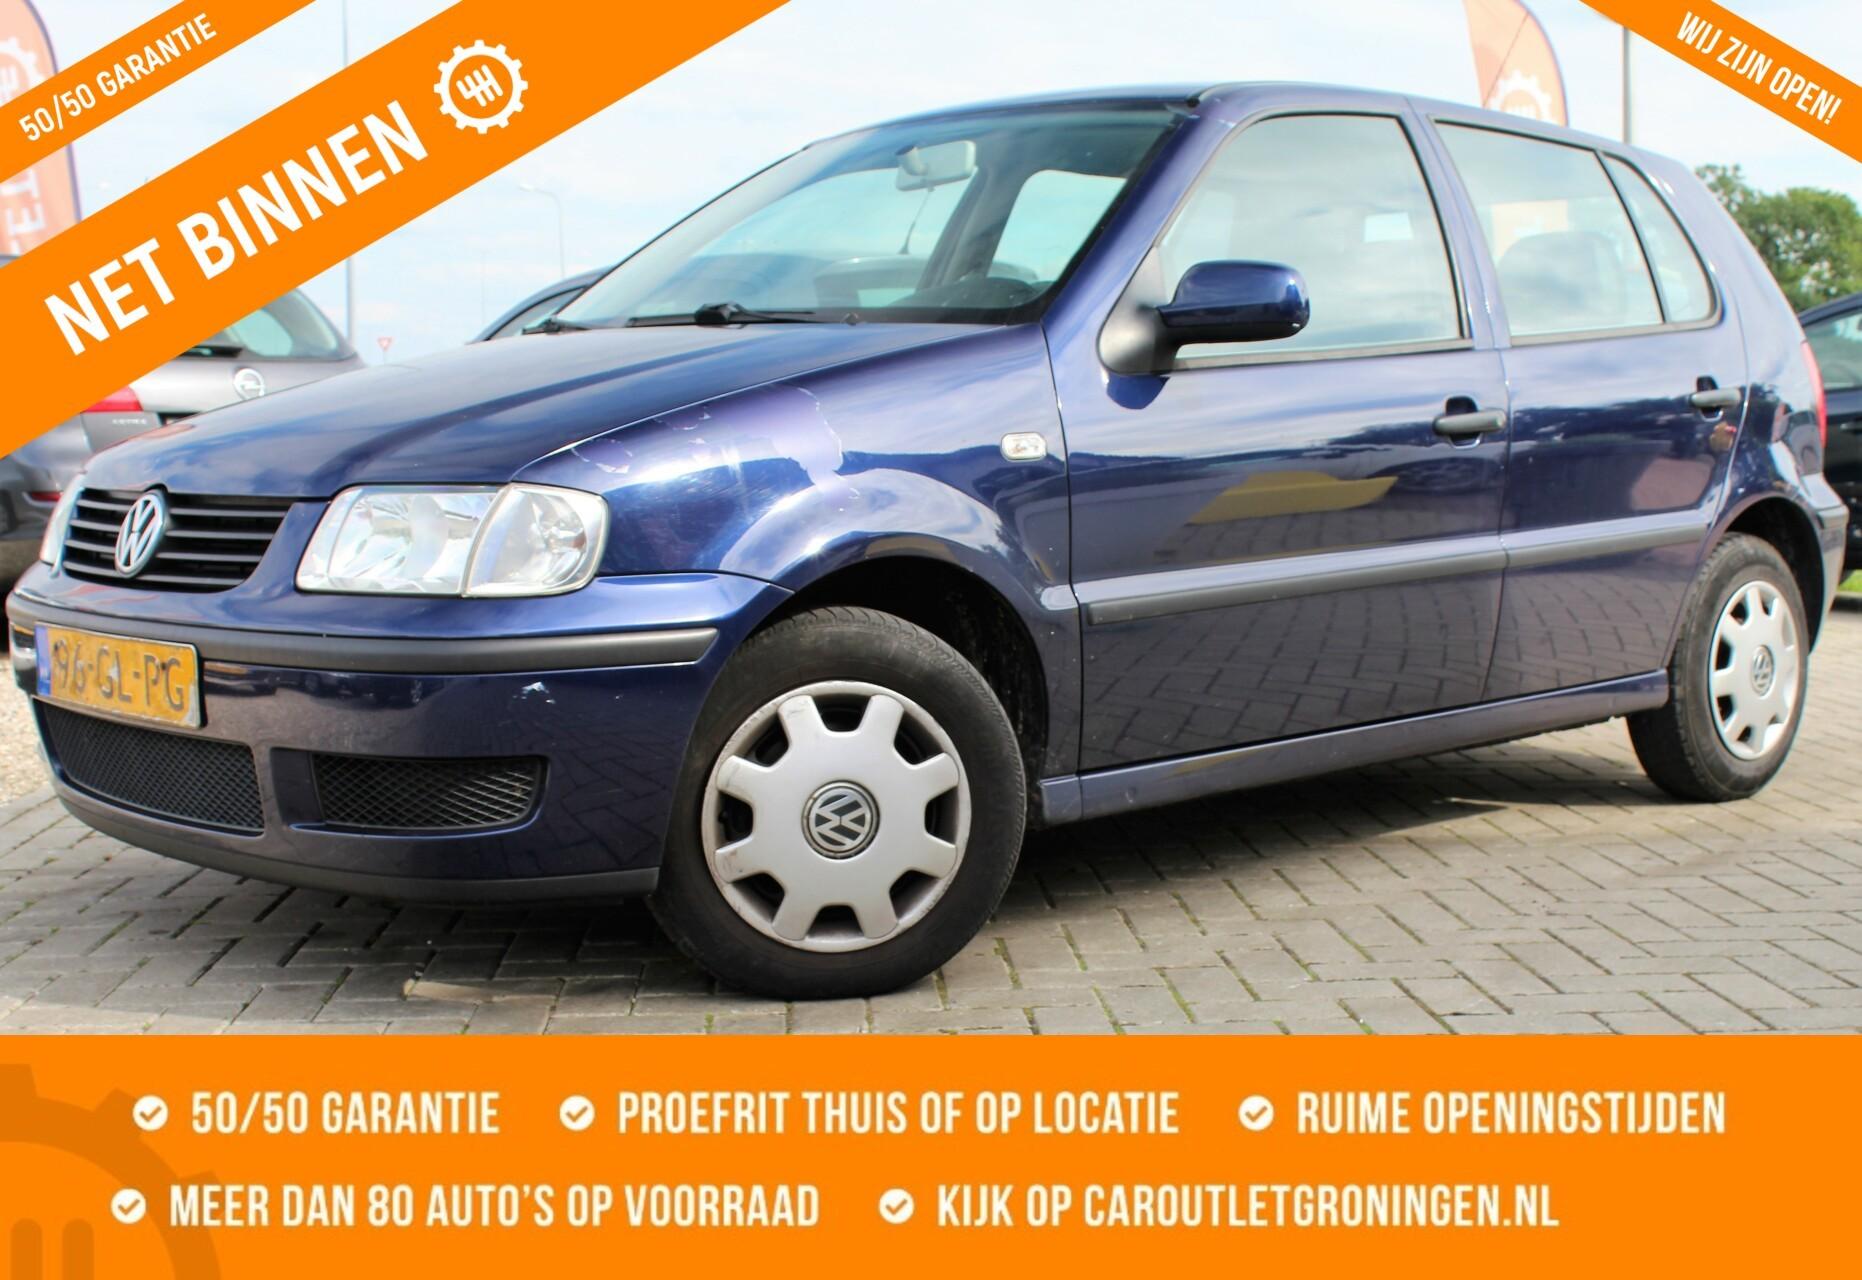 Volkswagen Polo 1.4 Comfortline | AIRCO| INRUILKOOPJE